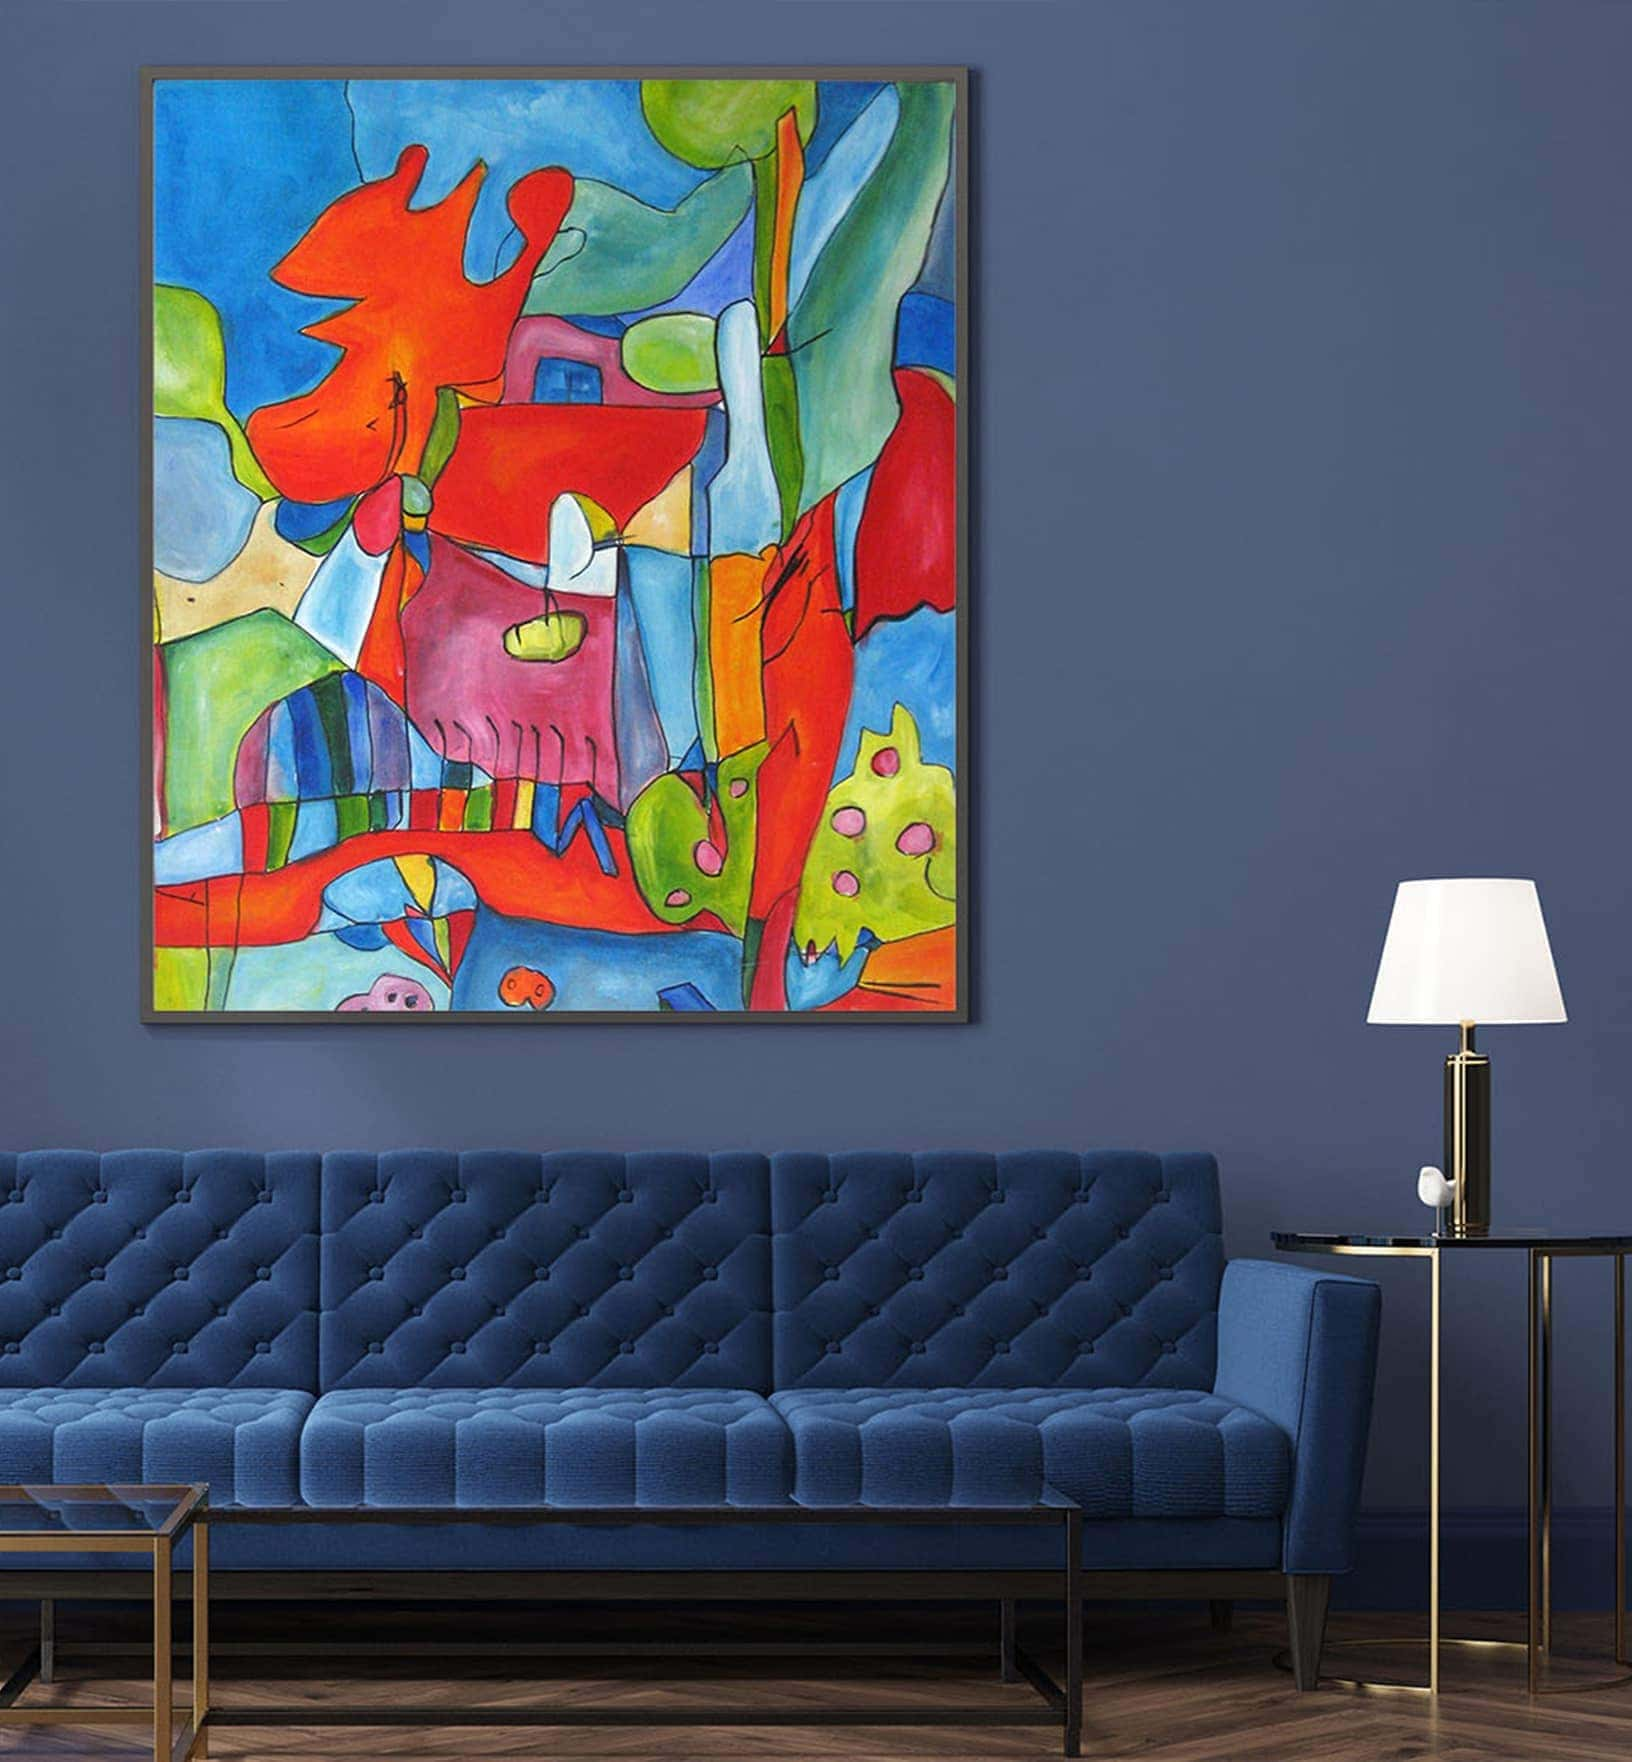 Acrylic paintings on wall modern artwork